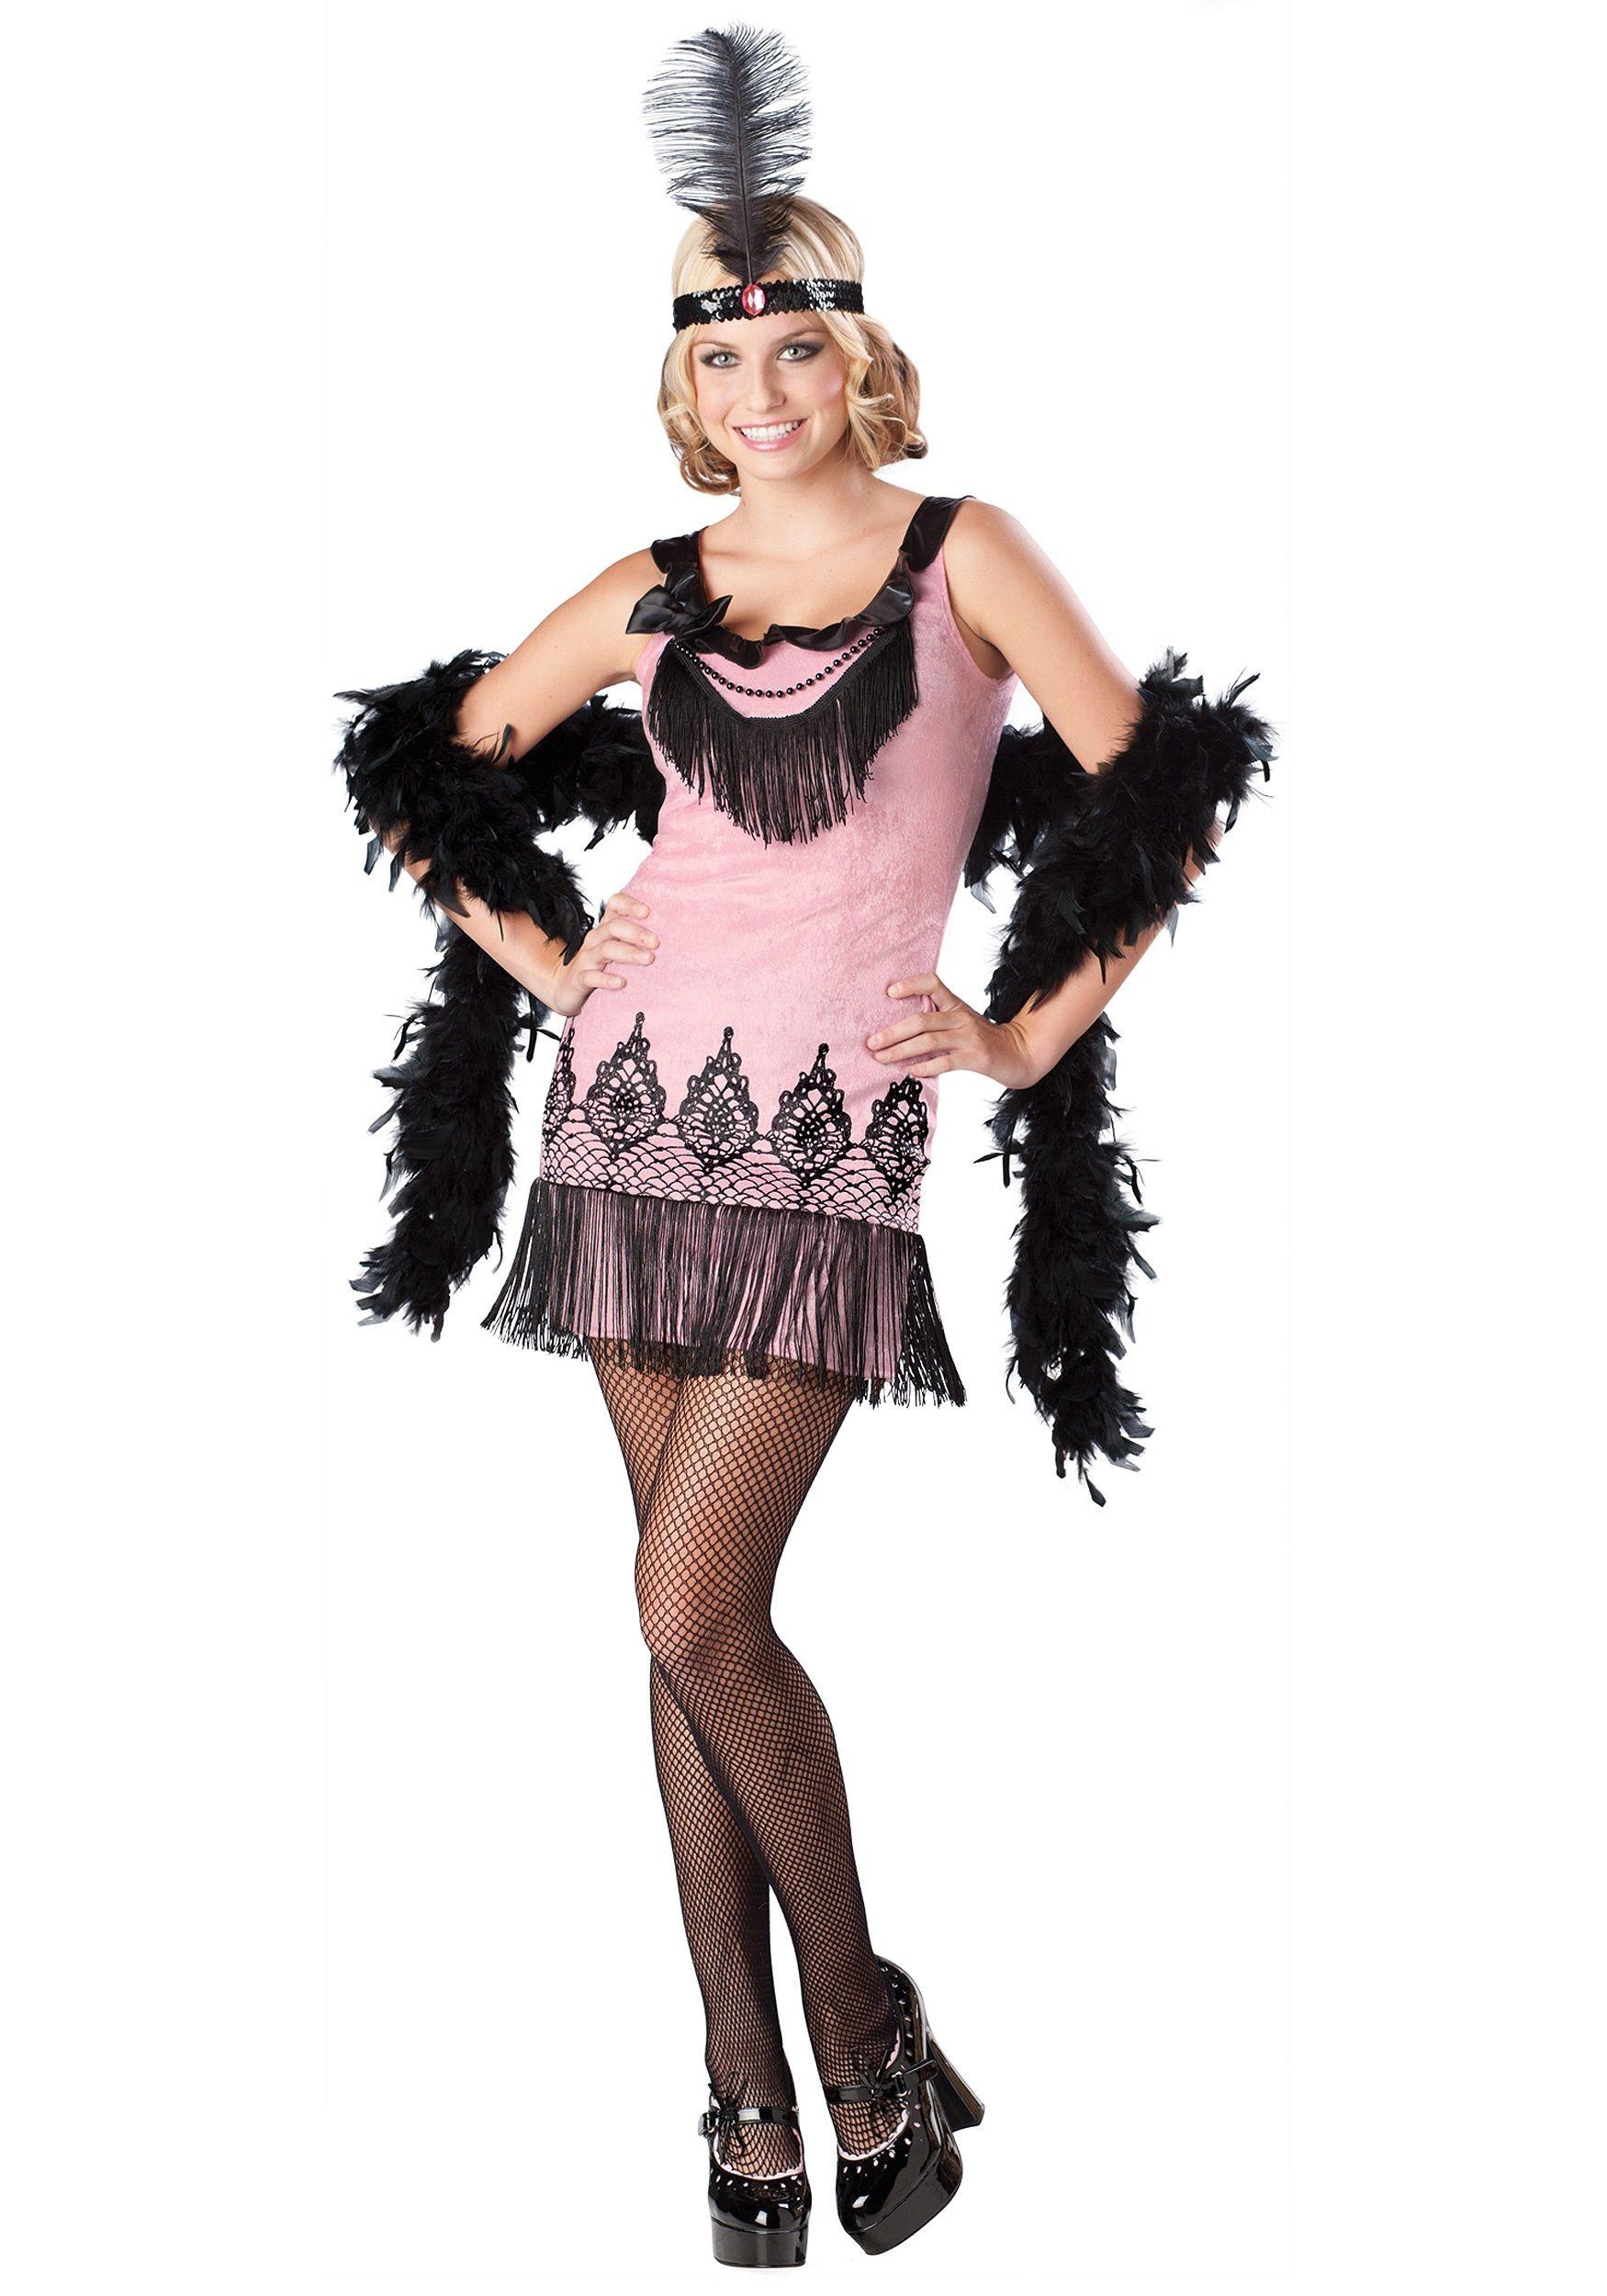 Womens 1920s flapper dress fancy dress costume adult flapper dress - Halloween Costumes For Teenage Girls Flirty Flapper Teen Girls Costume